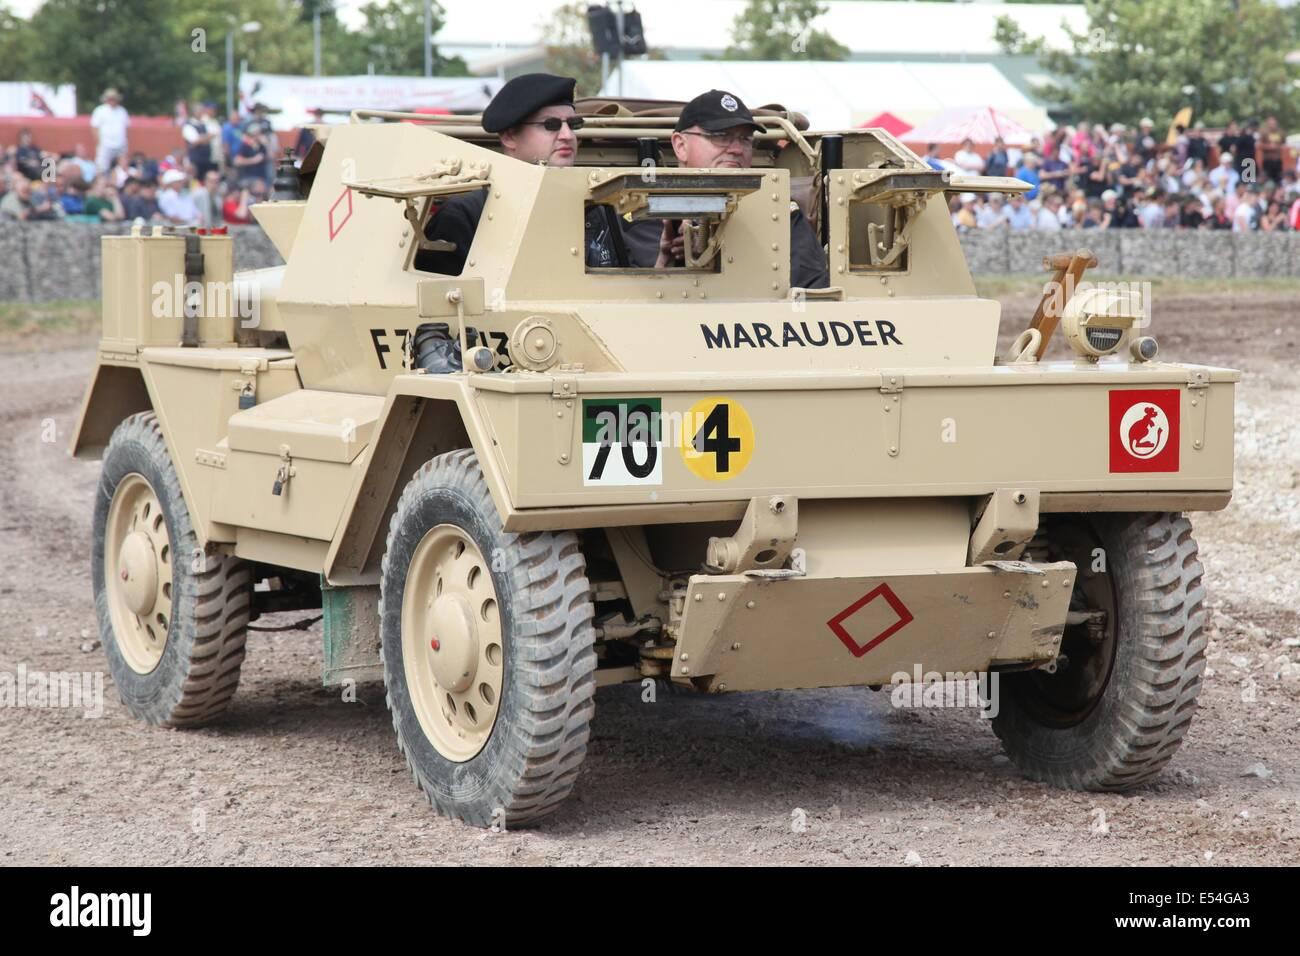 Daimler Dingo Scout Car Mark II - Bovington - Stock Image